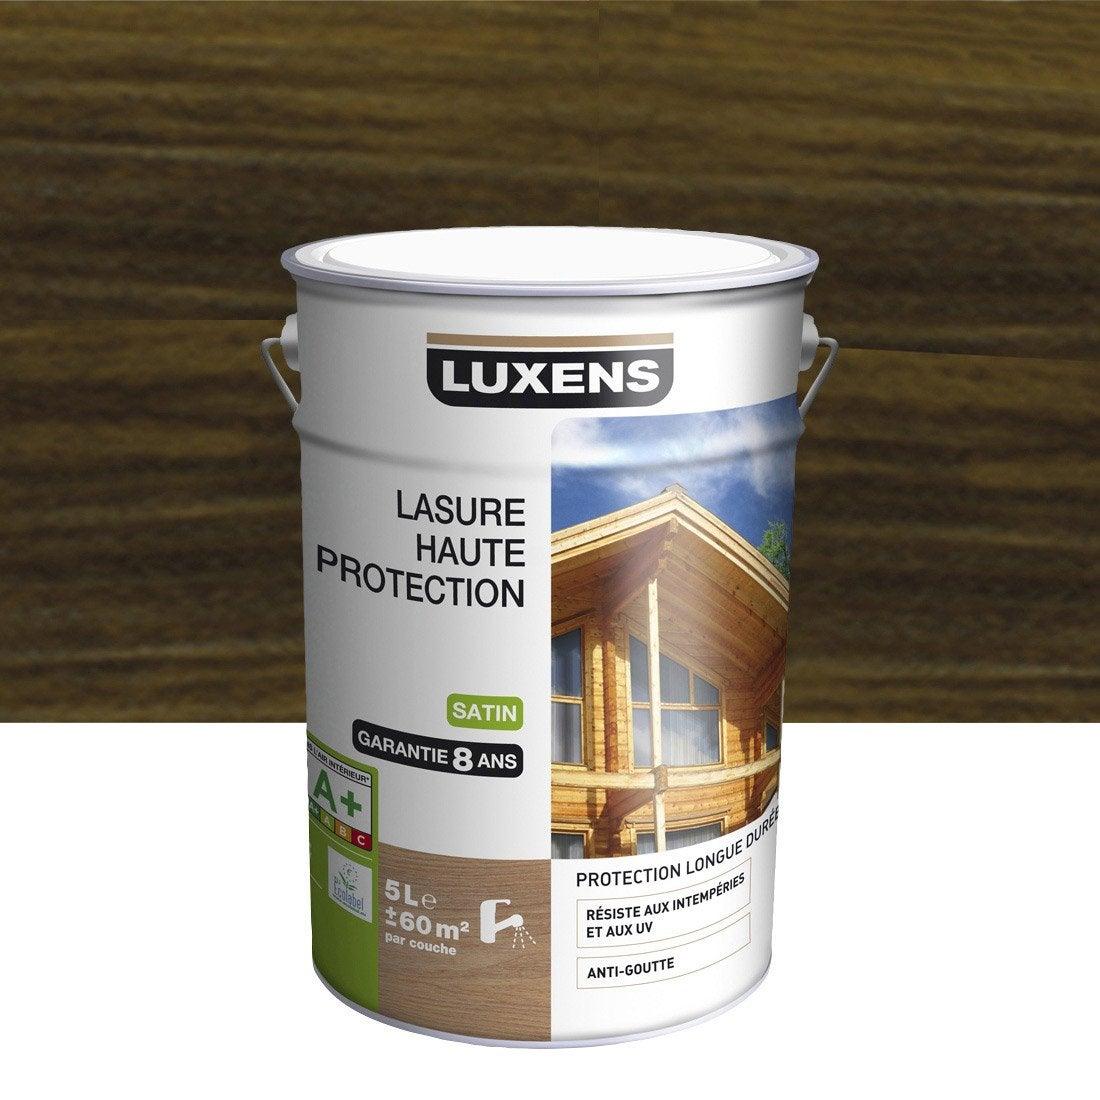 Lasure luxens haute protection 5 l weng leroy merlin - Lasure leroy merlin ...